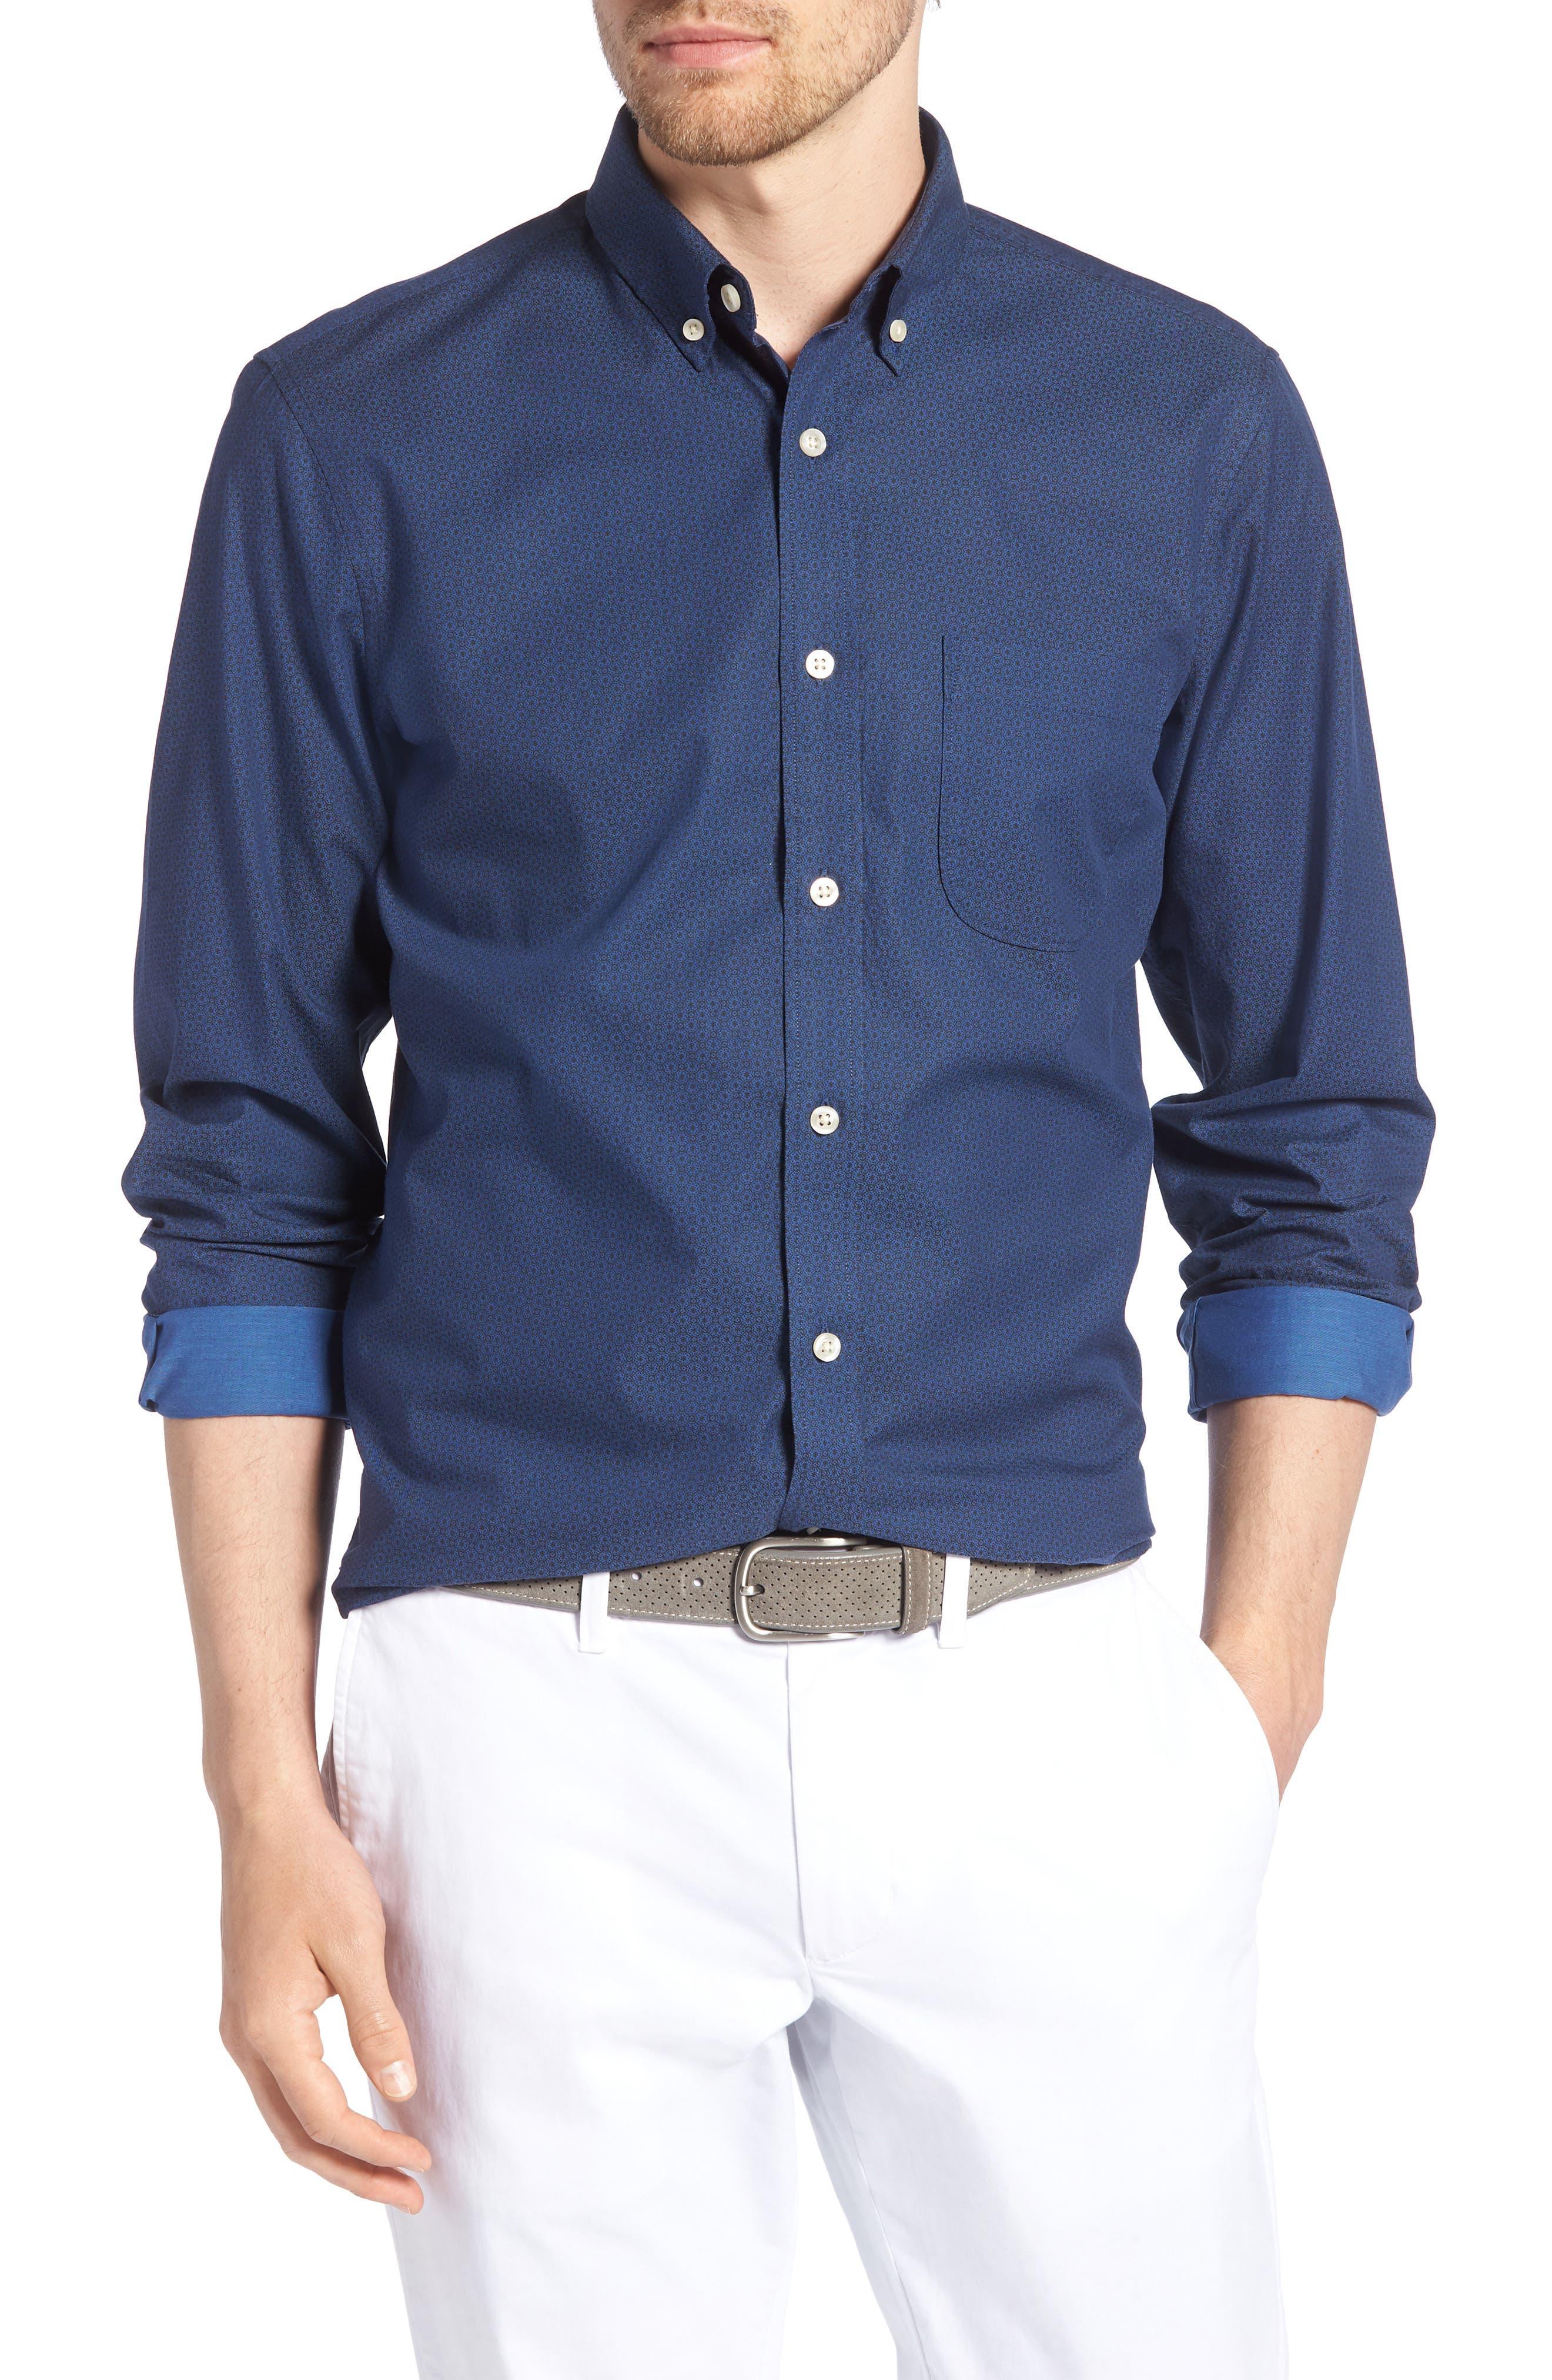 Trim Fit Round Pocket Sport Shirt,                             Main thumbnail 1, color,                             Blue Black Flower Print